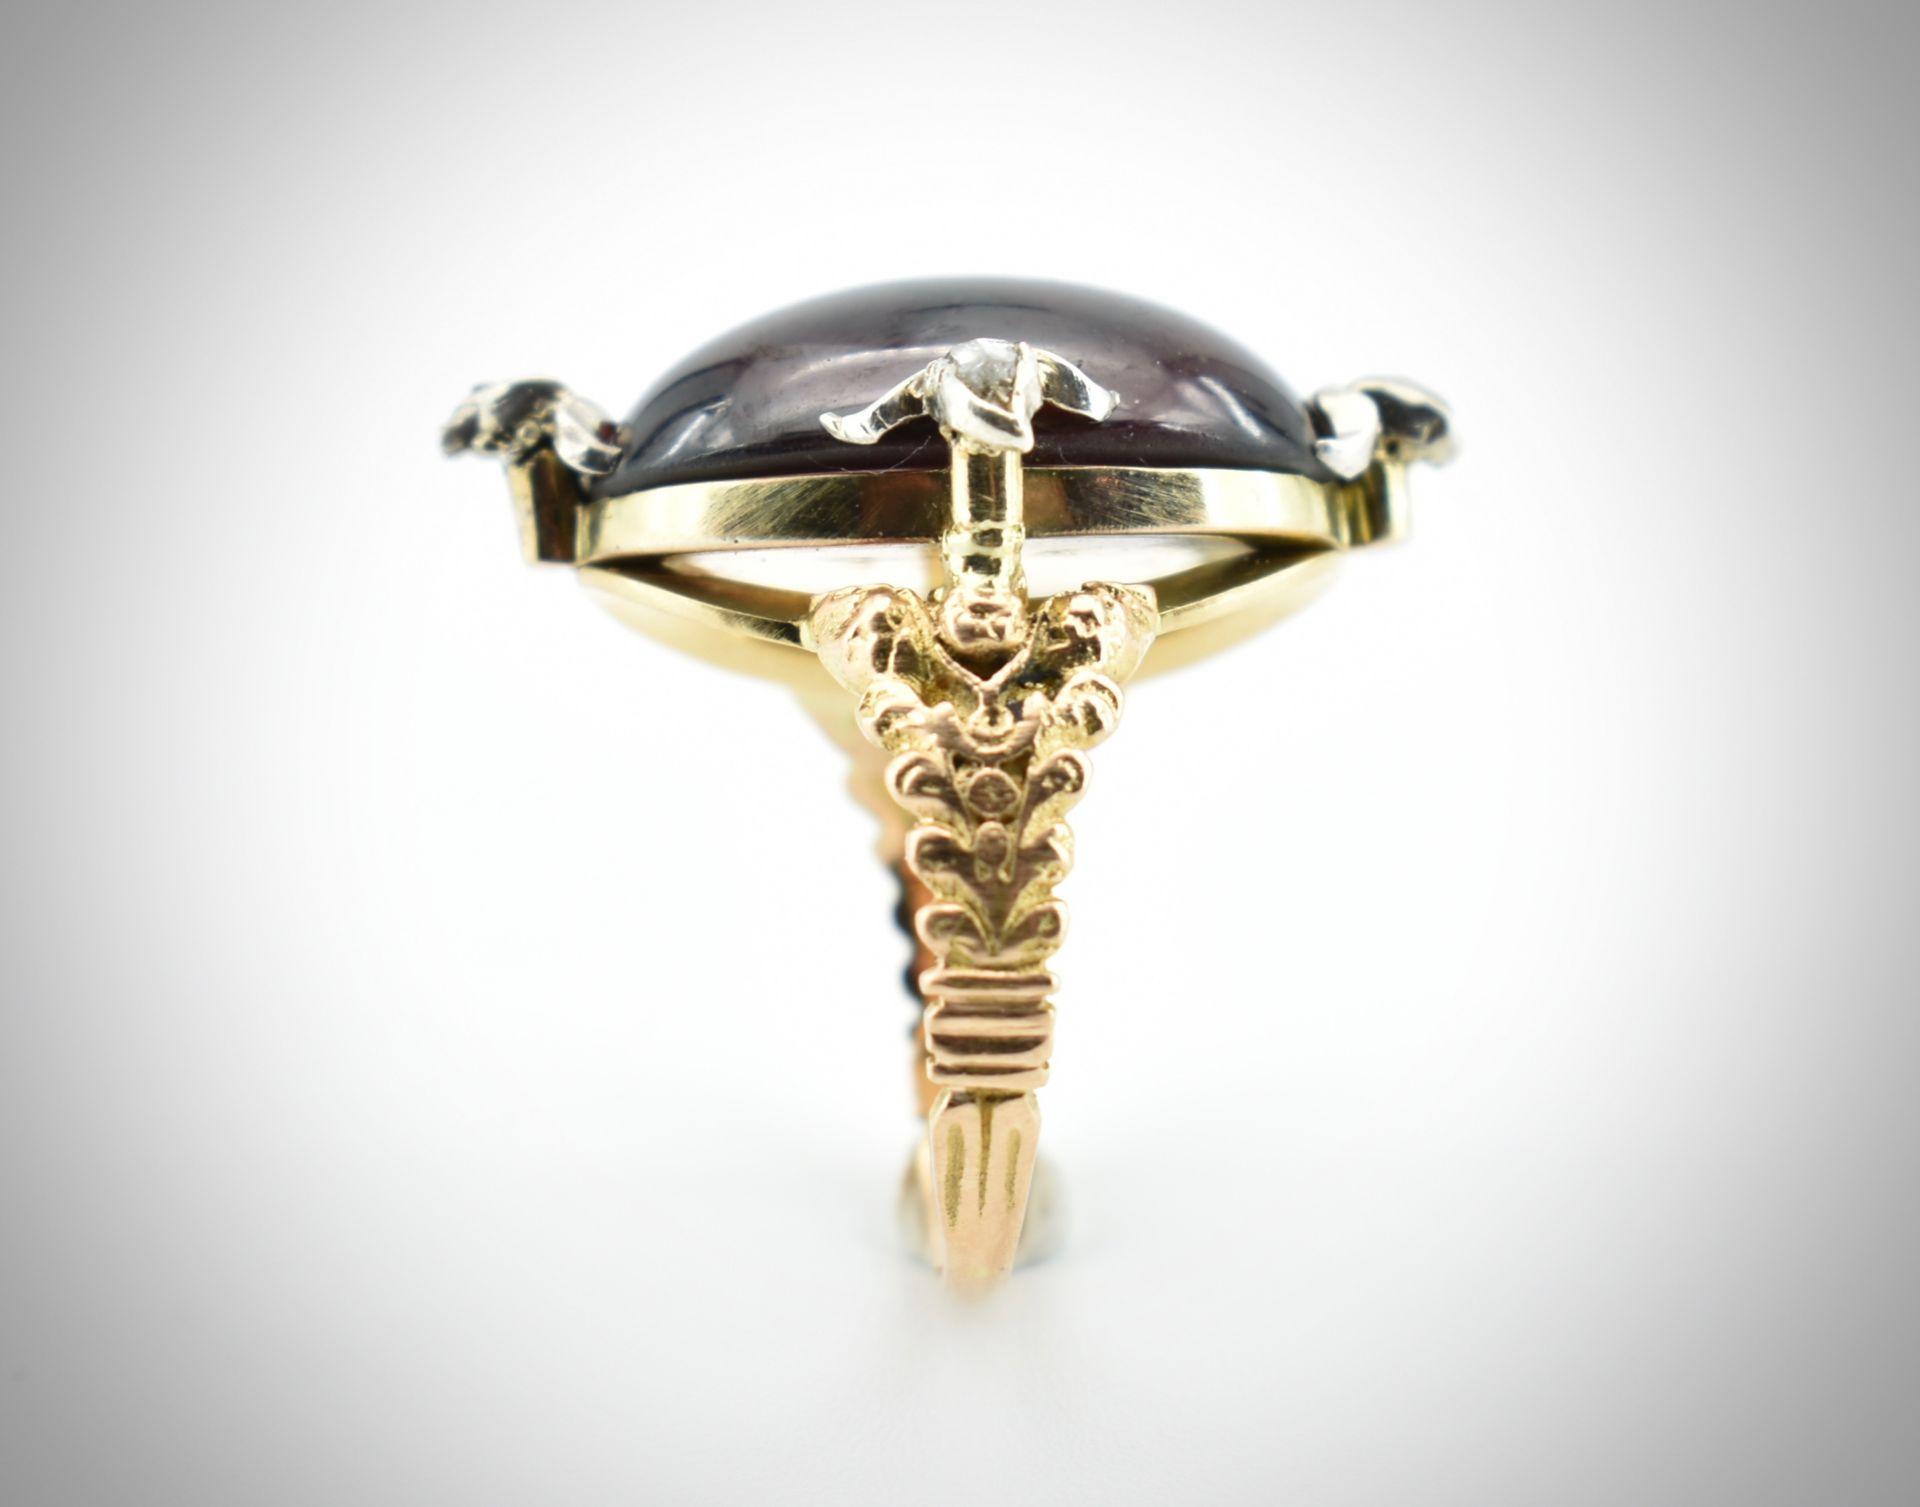 Antique Garnet & Diamond Ring. - Image 3 of 3